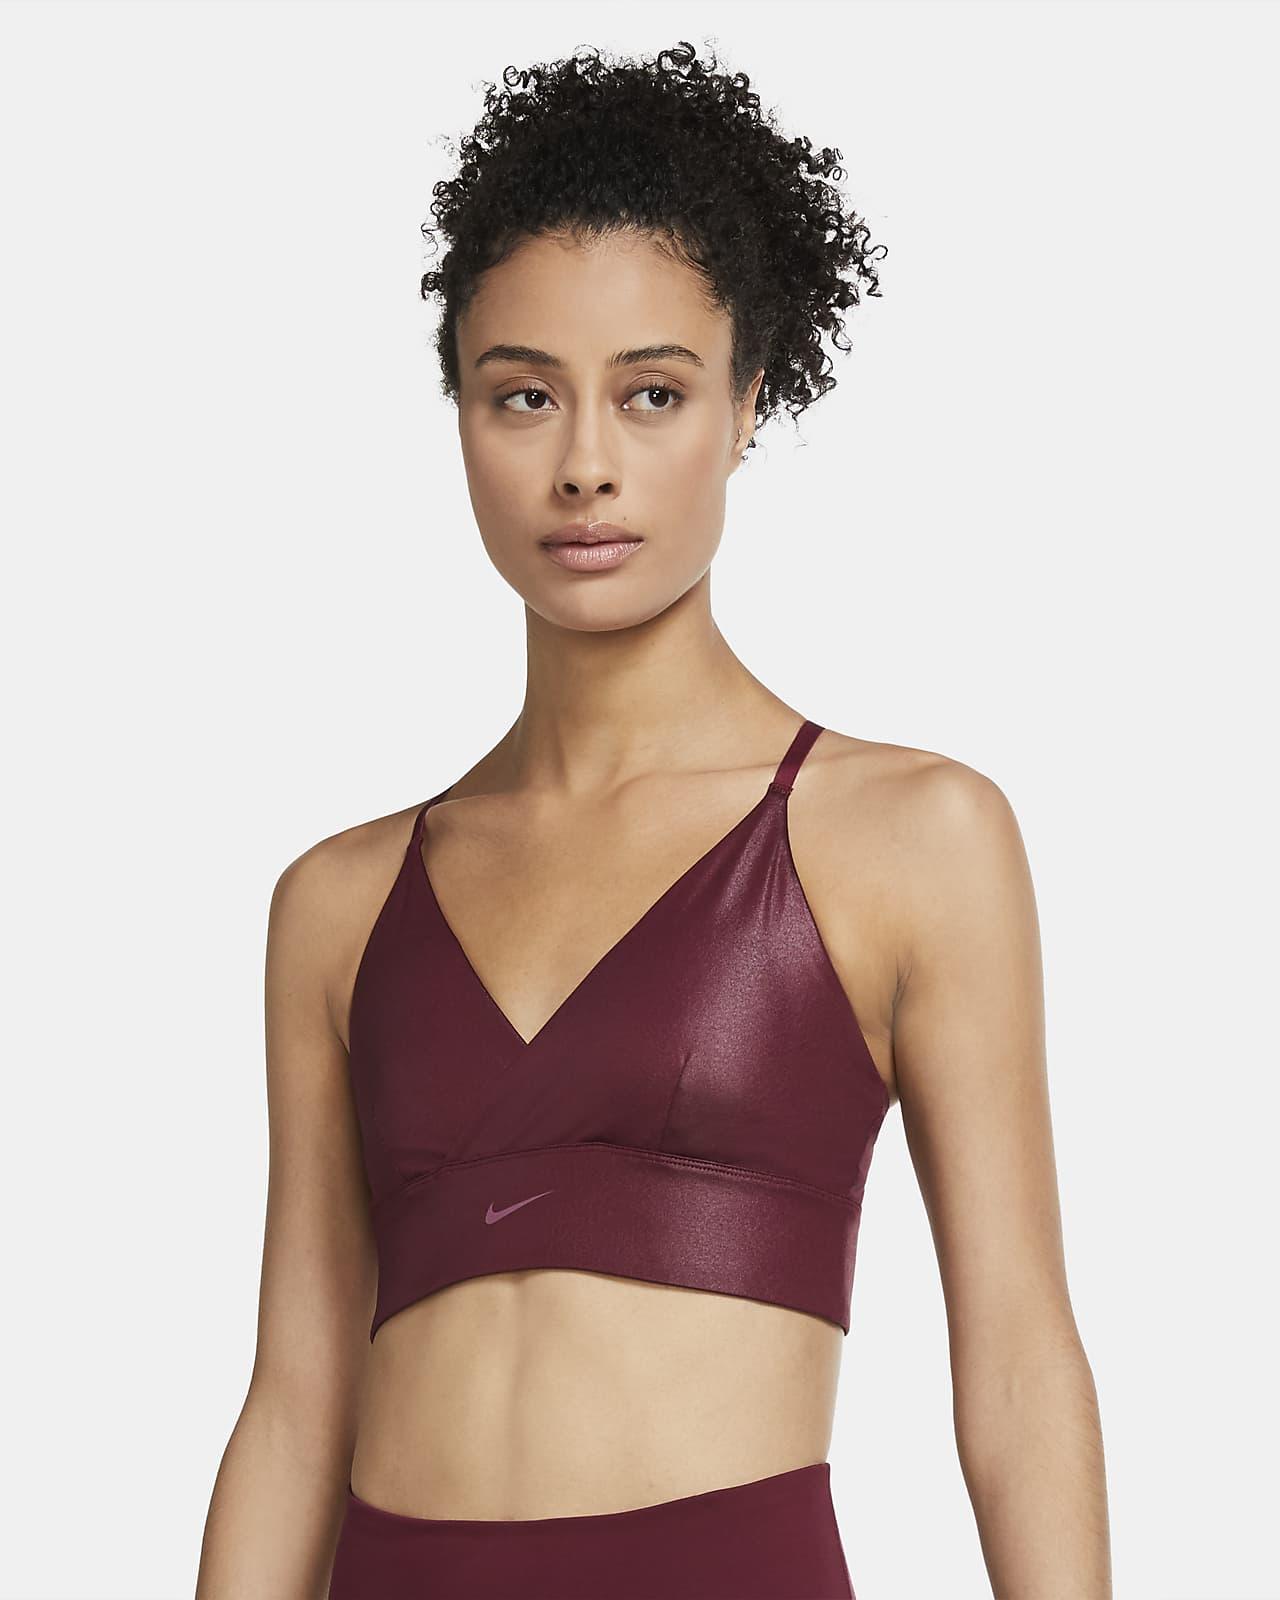 Nike Indy Women's Light-Support Shine Sports Bra